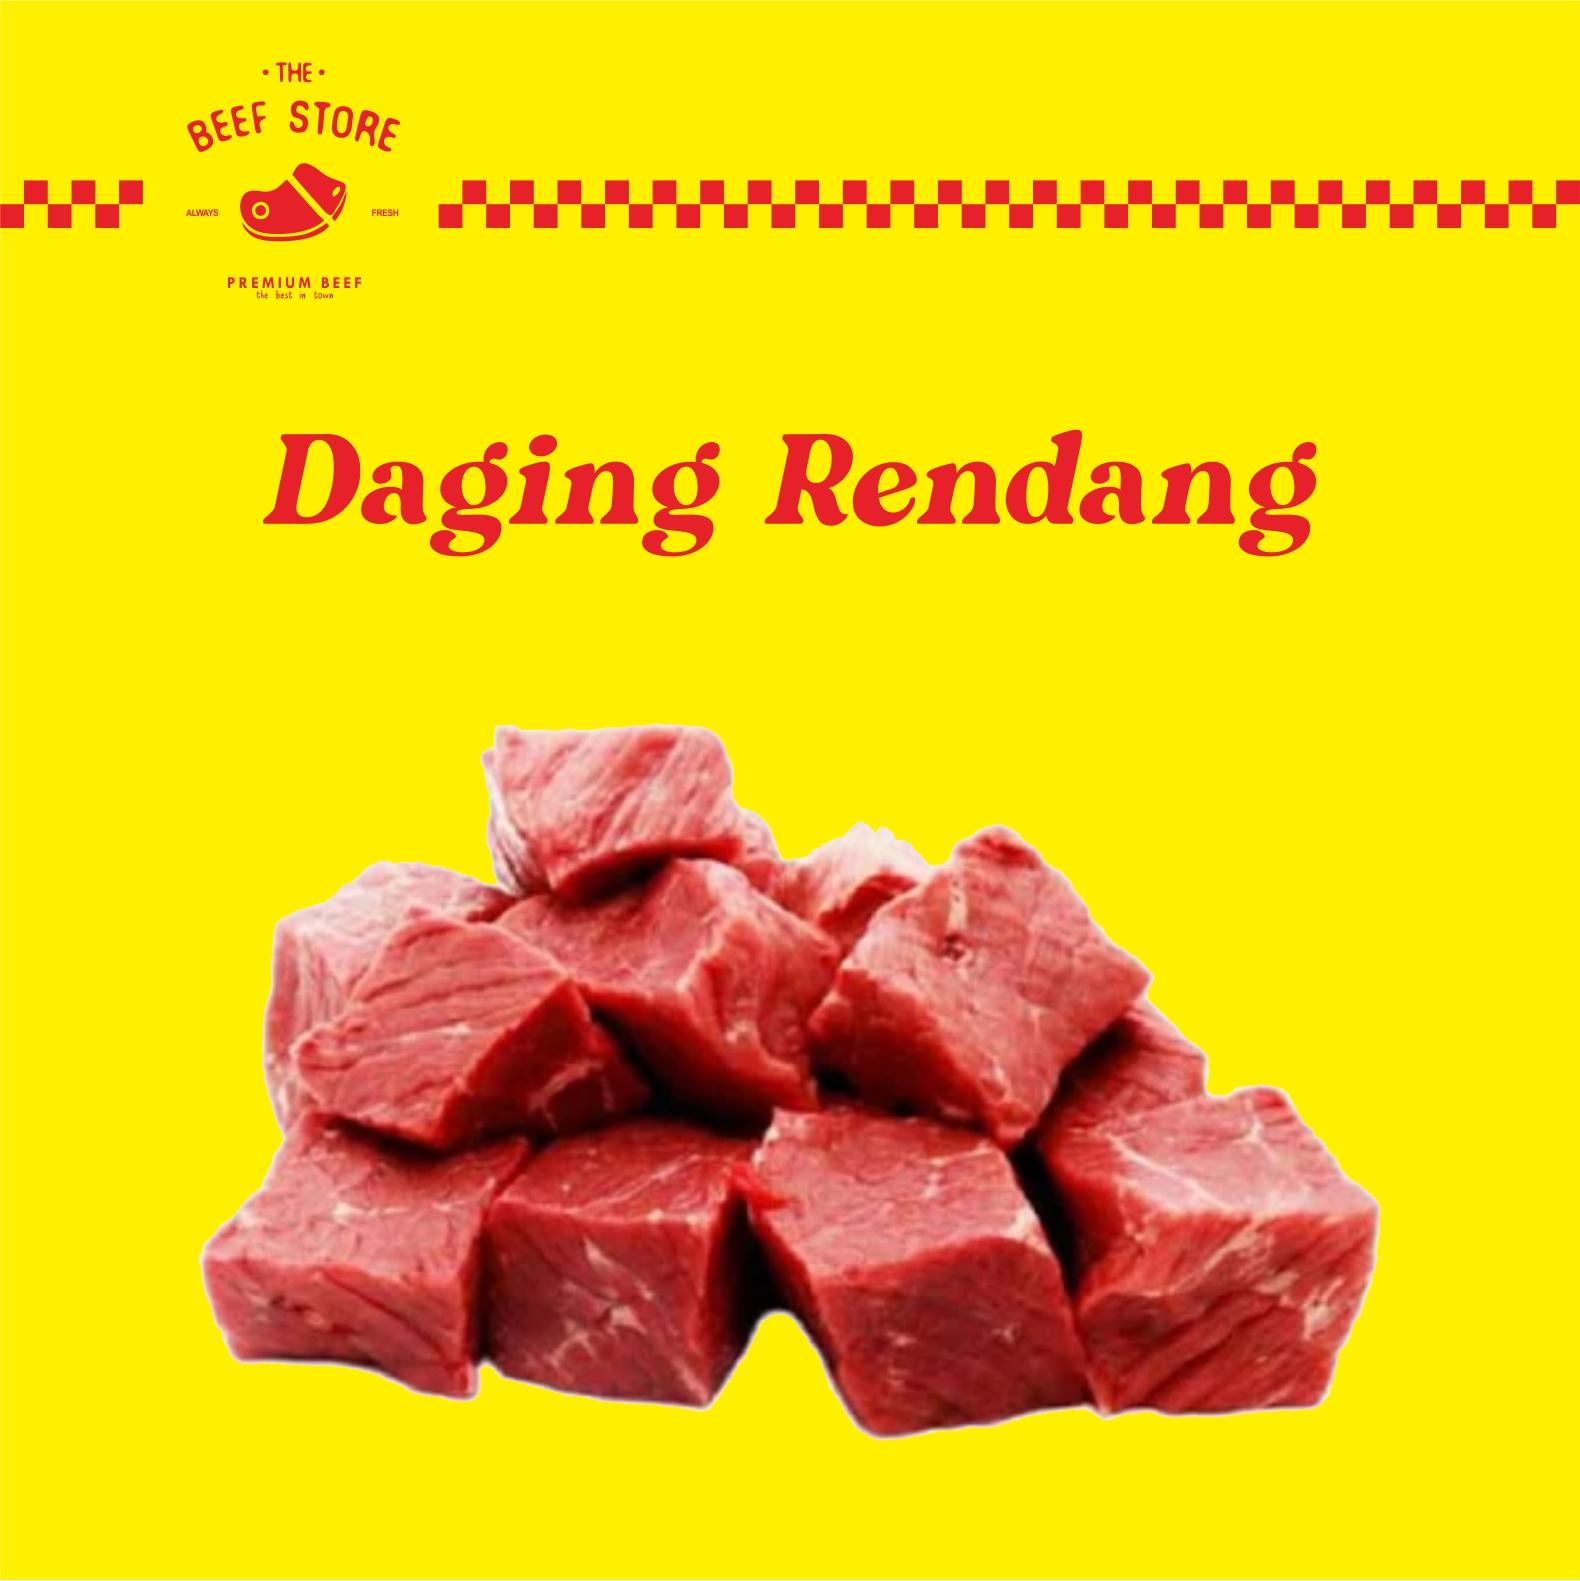 Daging Rendang